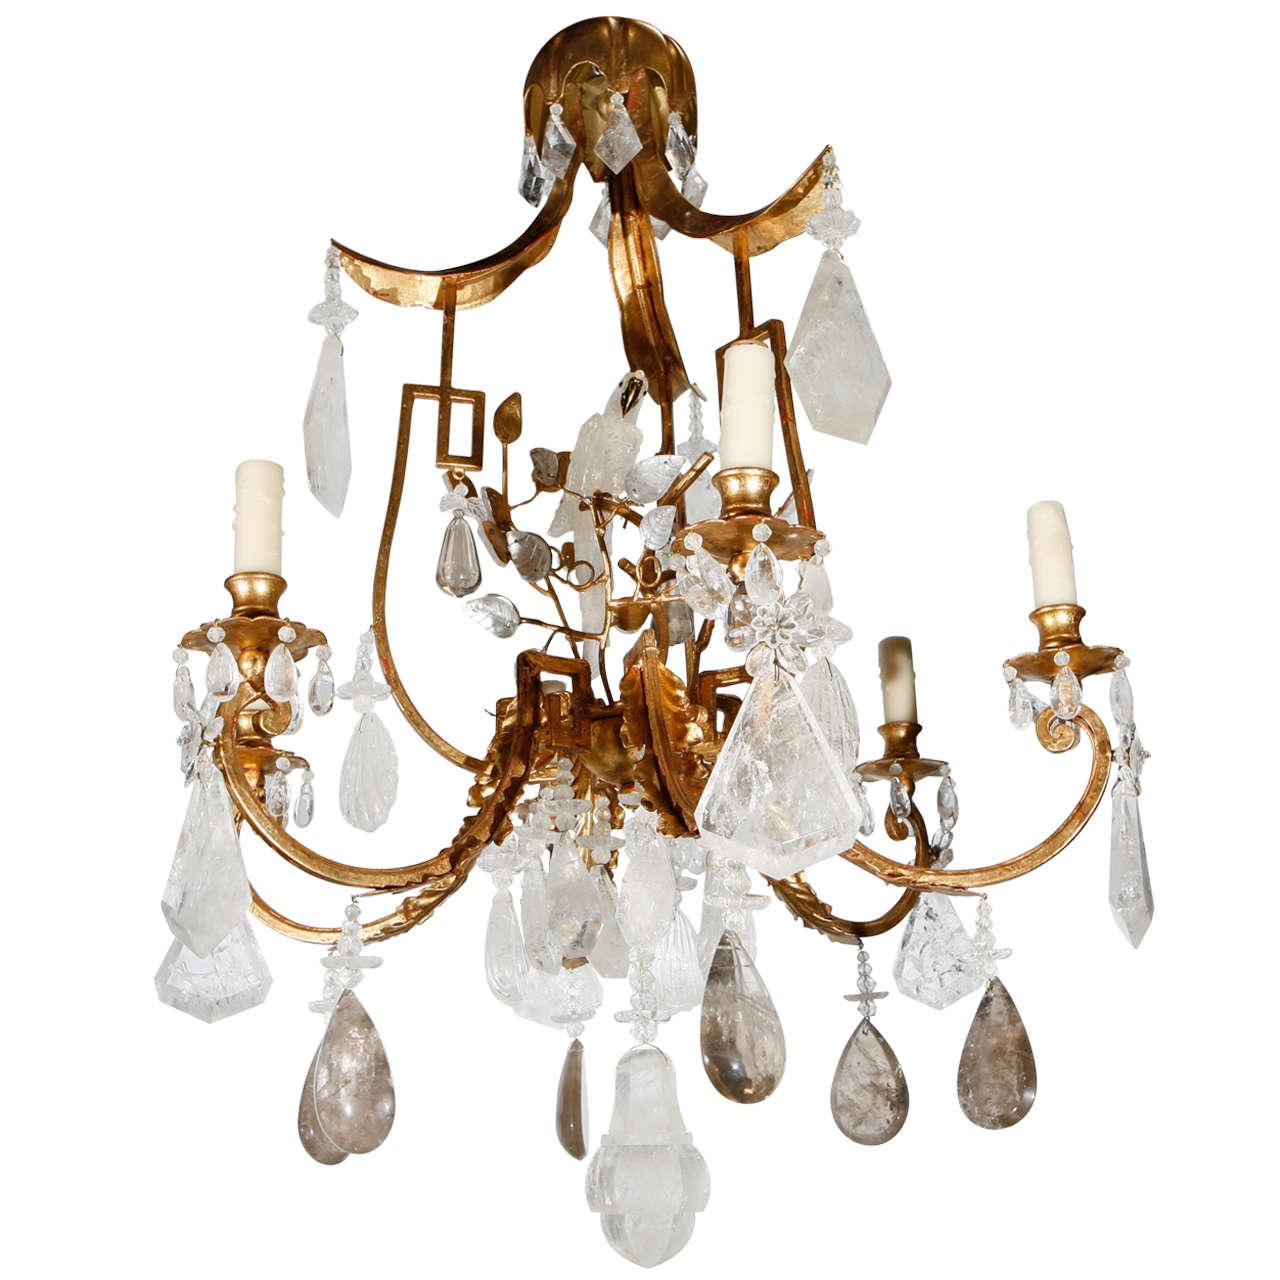 Ornate Italian Chandelier For Sale at 1stdibs